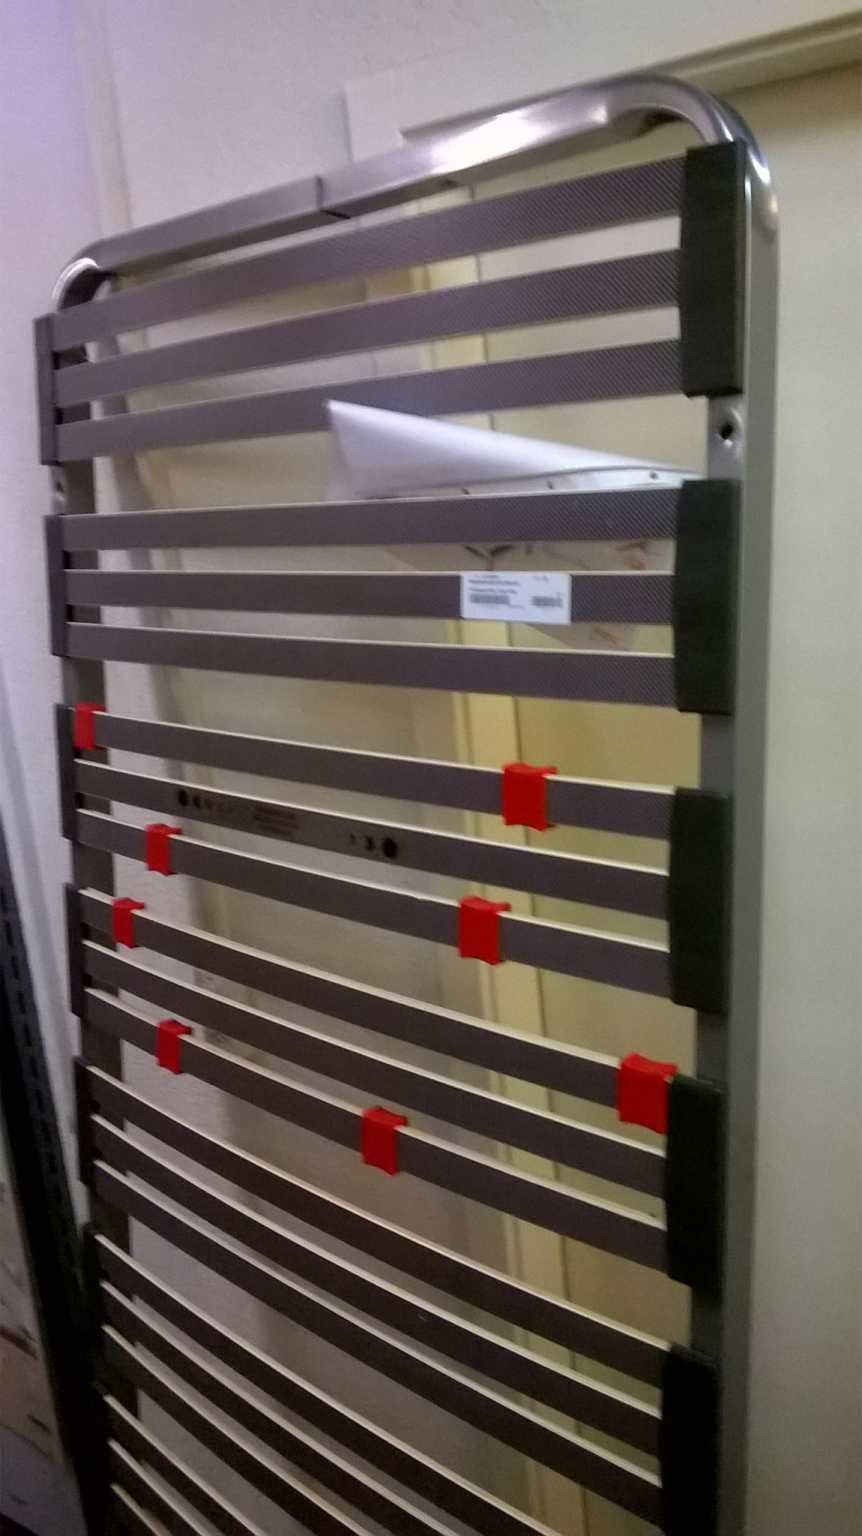 Lit gigogne en pin naturel 90 x 200 cm lits matelas - Lit gigogne 90 x 200 ...